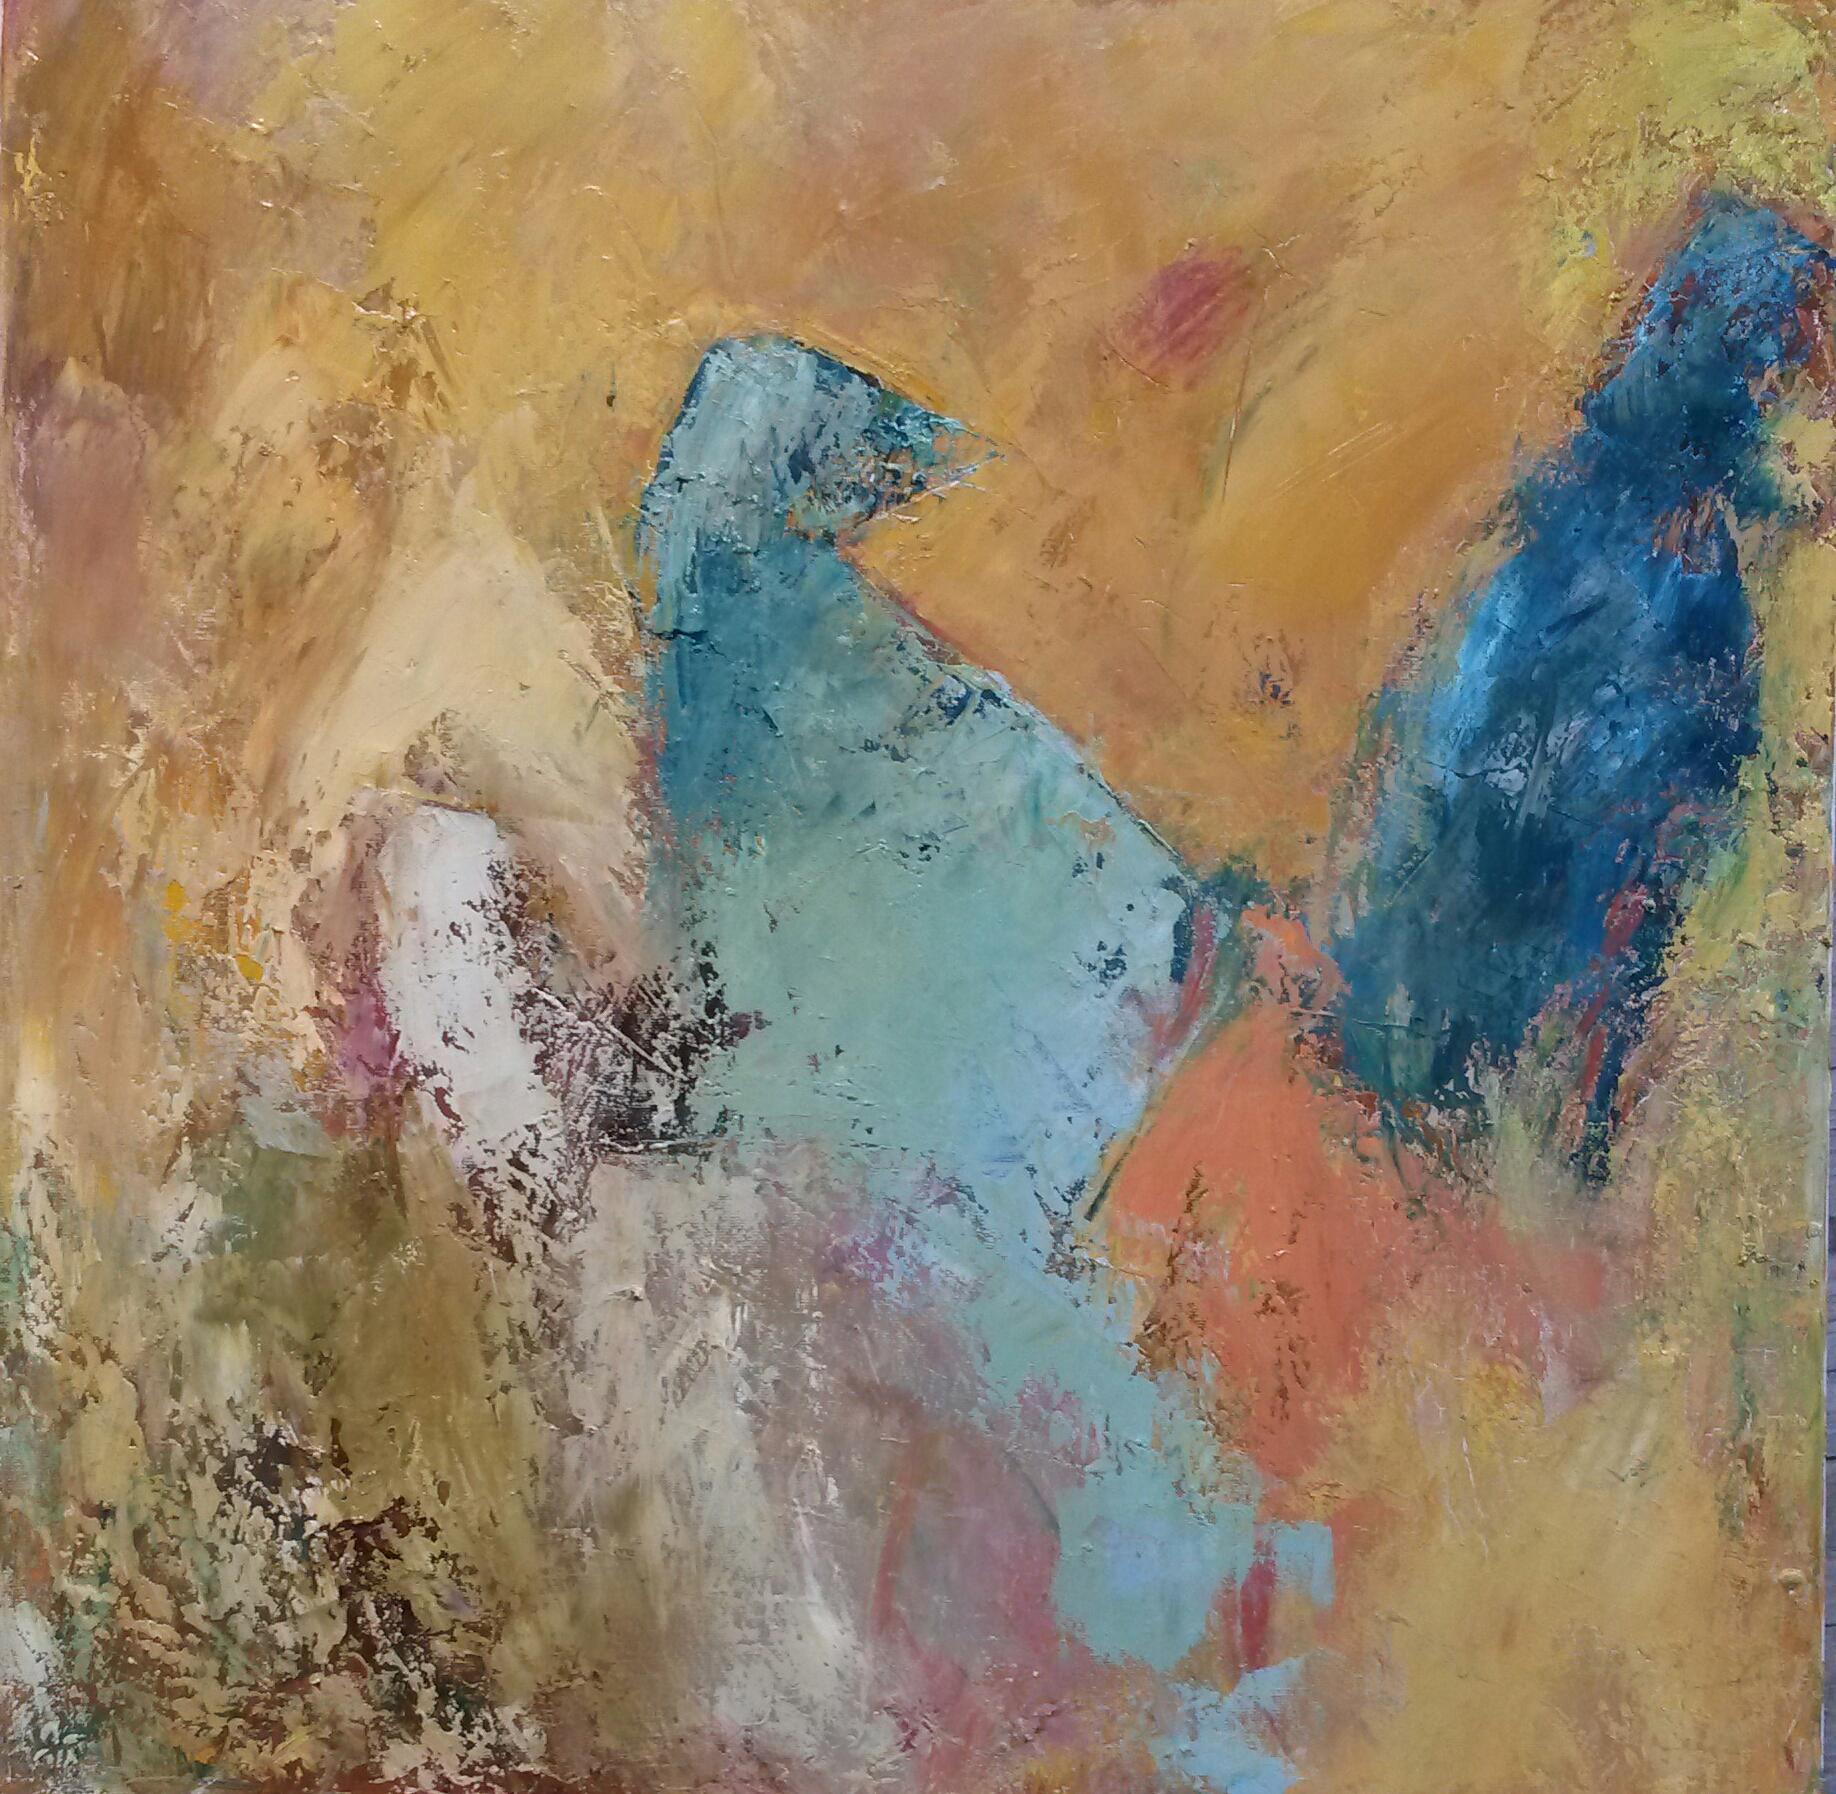 Silhouettes, 2016, t.m., 50x50cm